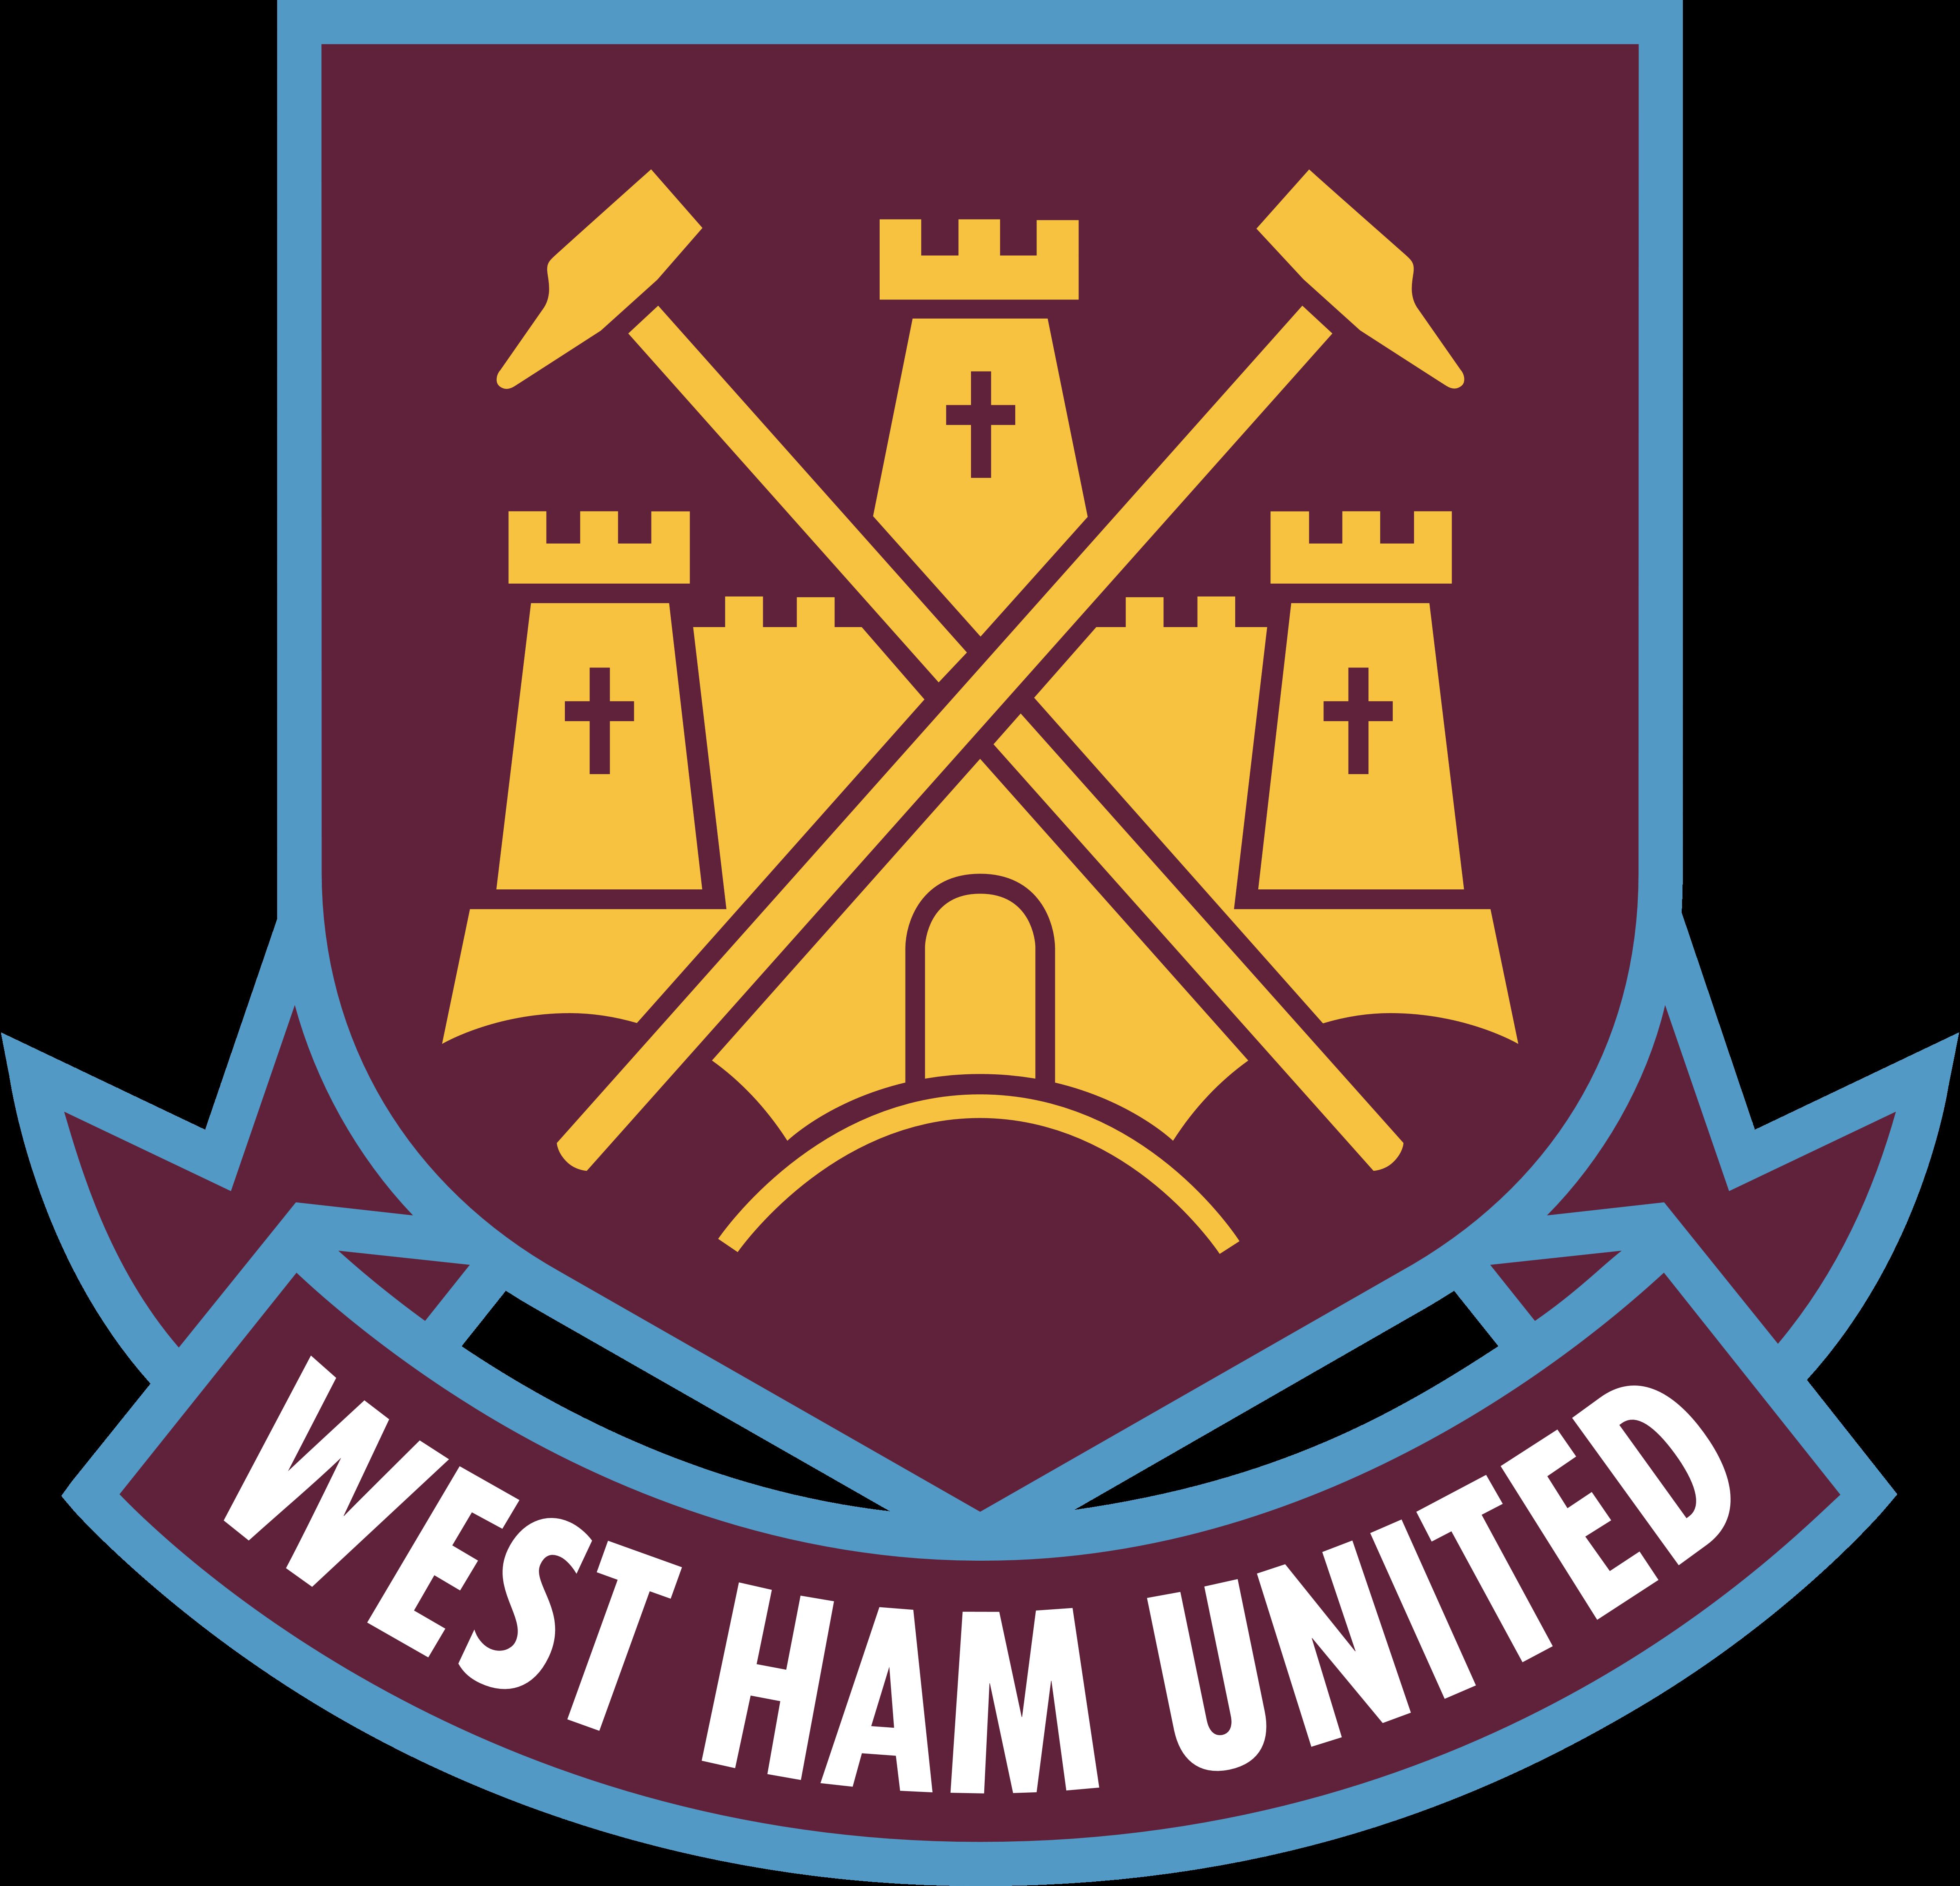 West Ham United Logos Download